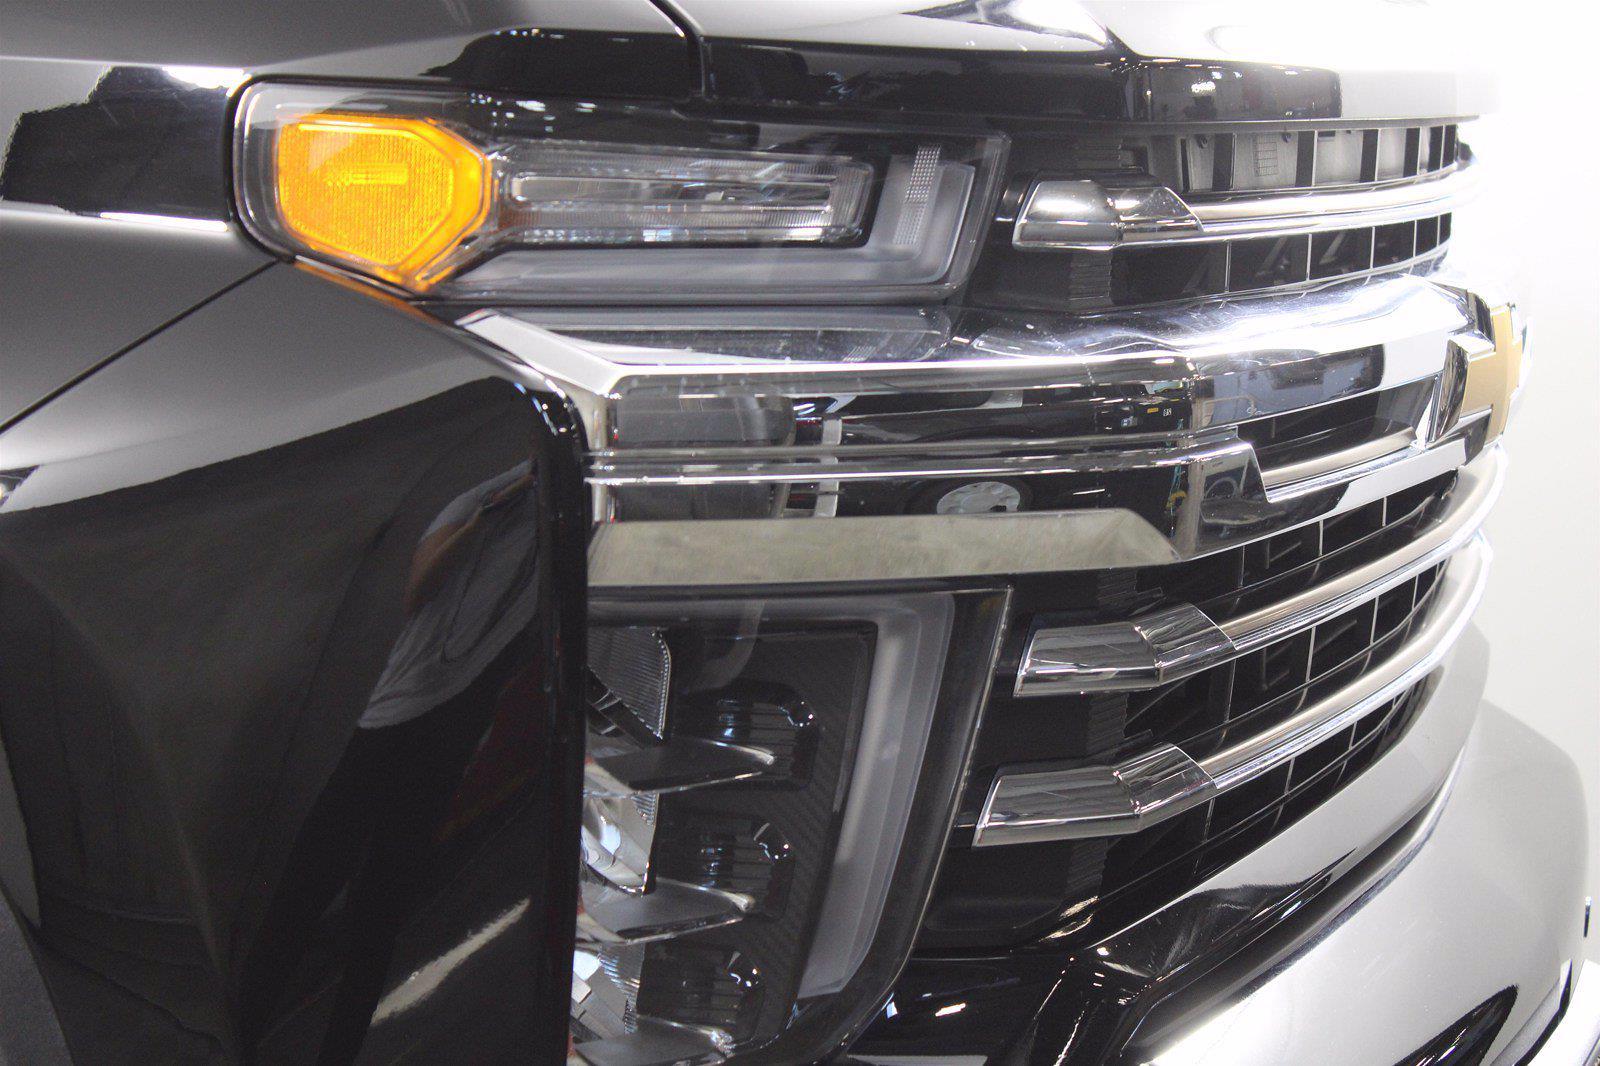 2020 Chevrolet Silverado 3500 Crew Cab 4x4, Pickup #DAZ0607 - photo 14